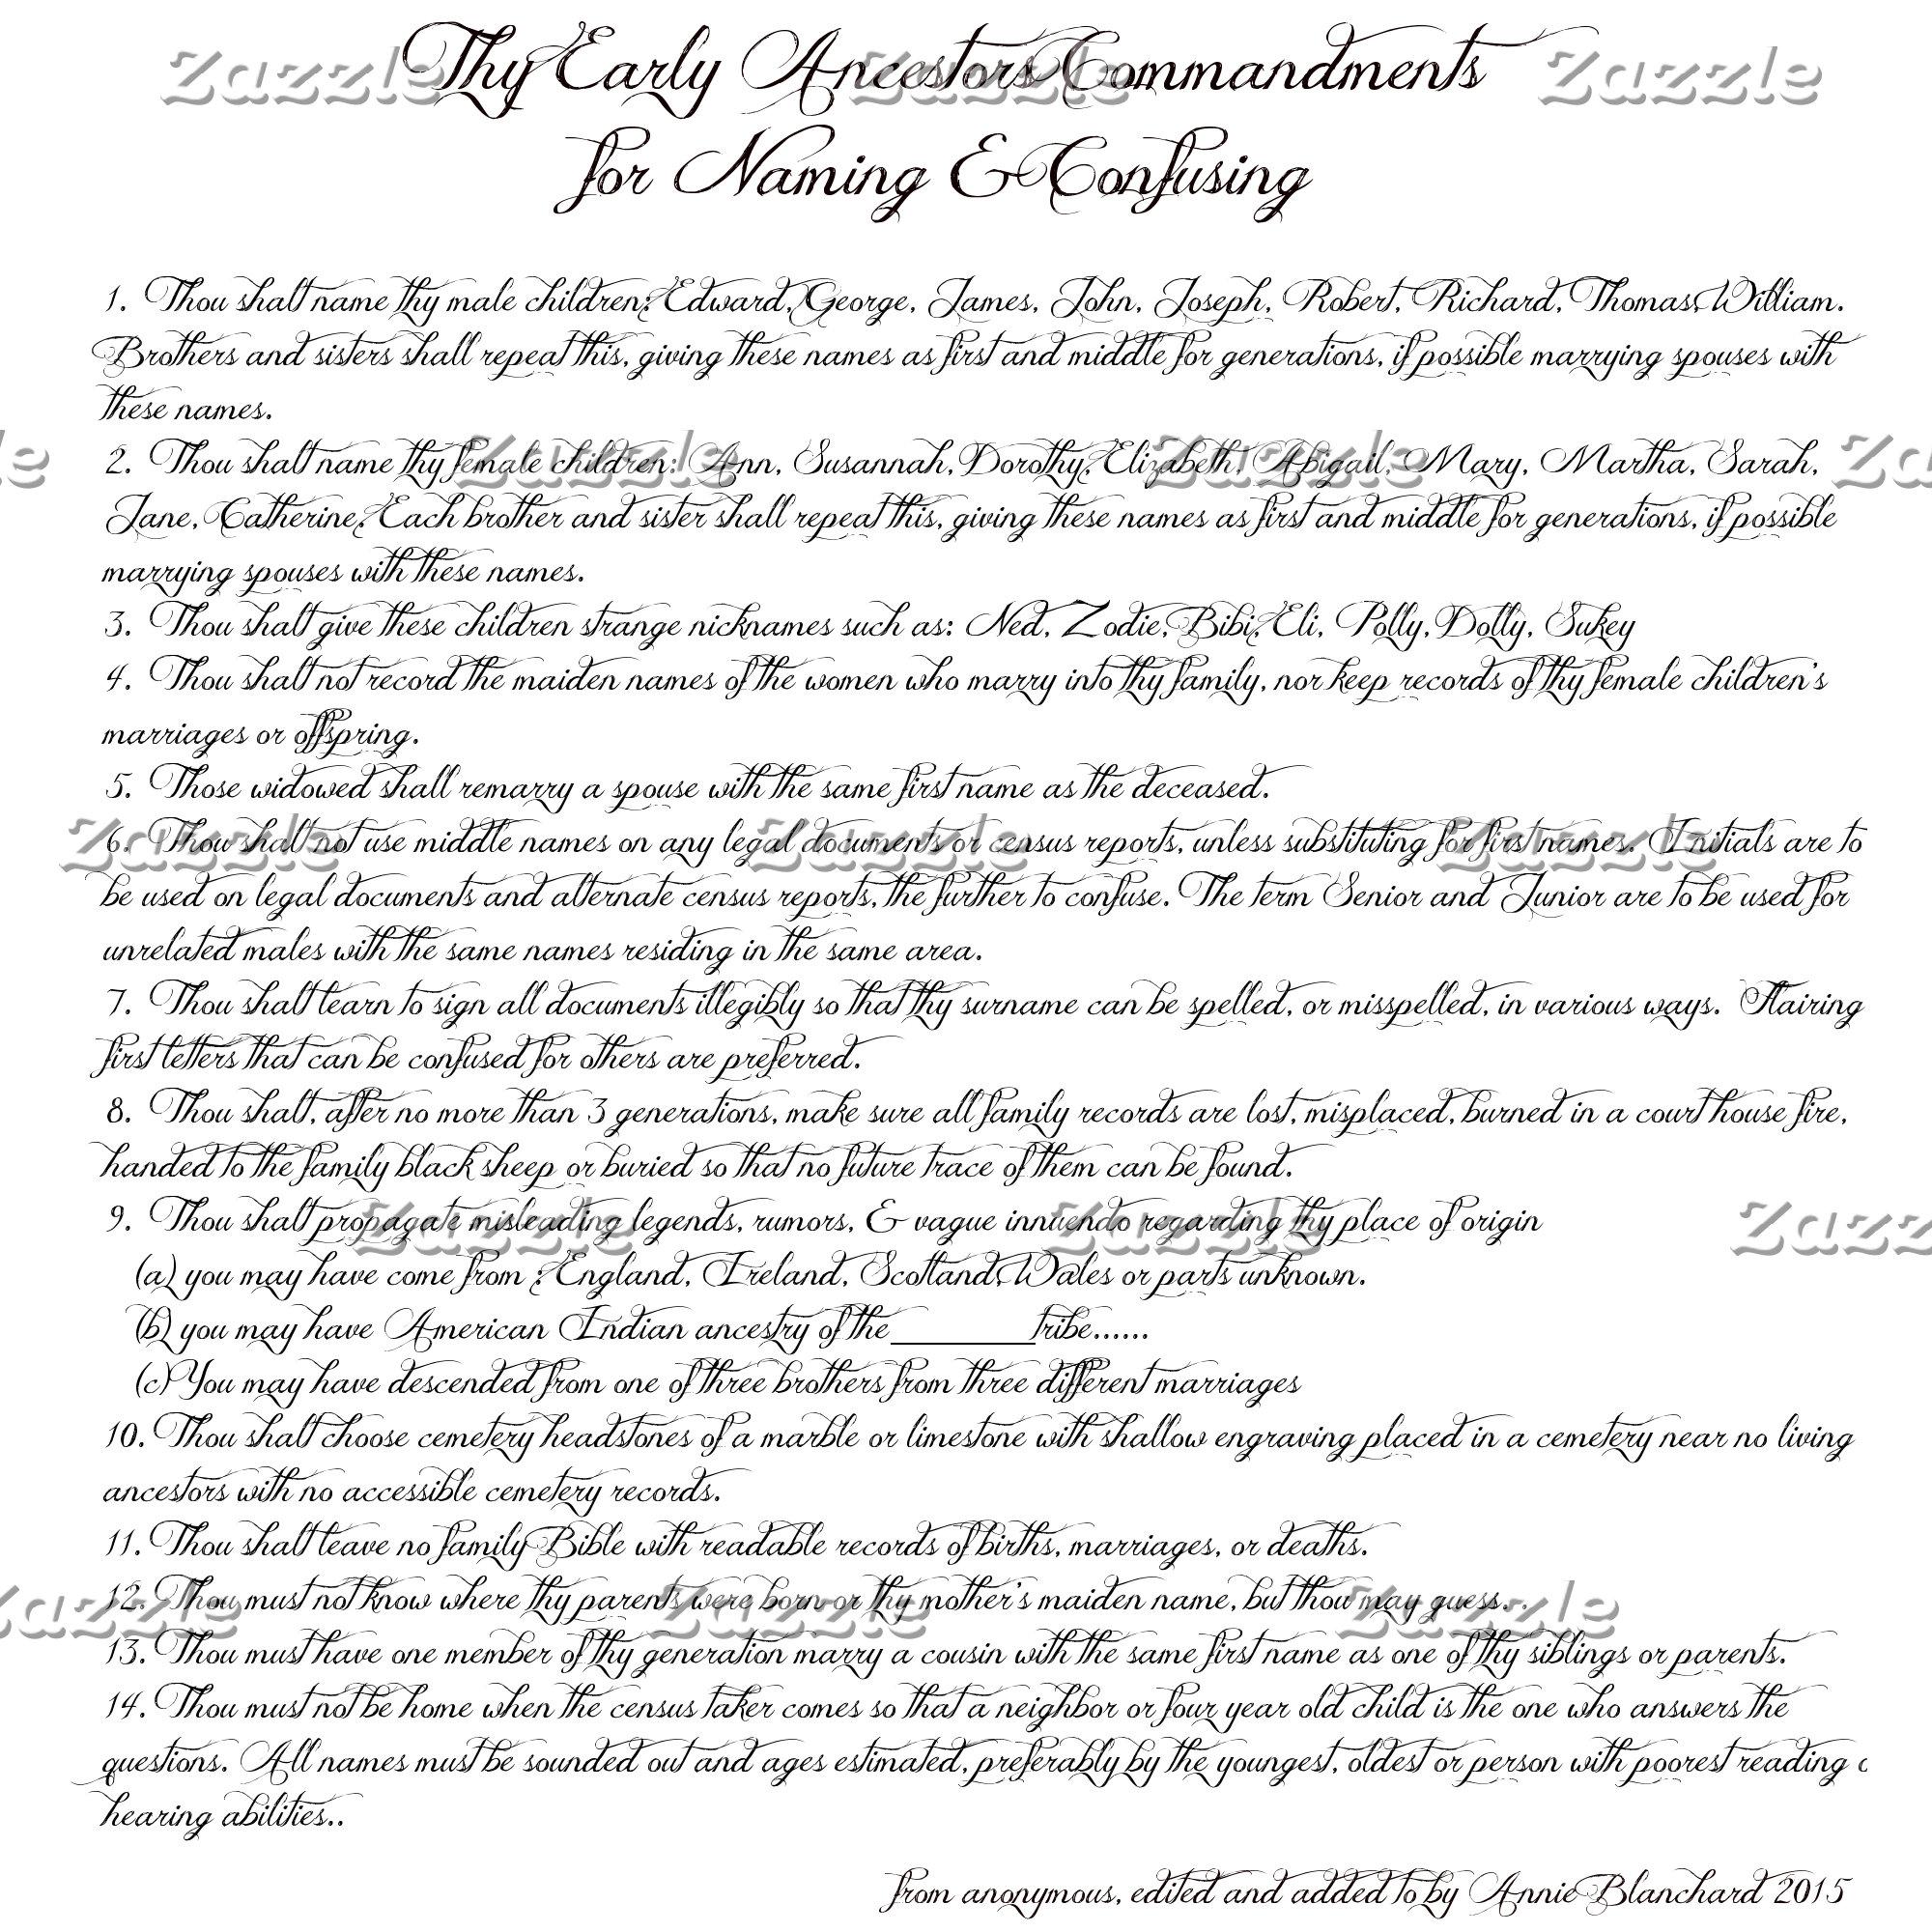 Humor - Early Ancestor Commandments